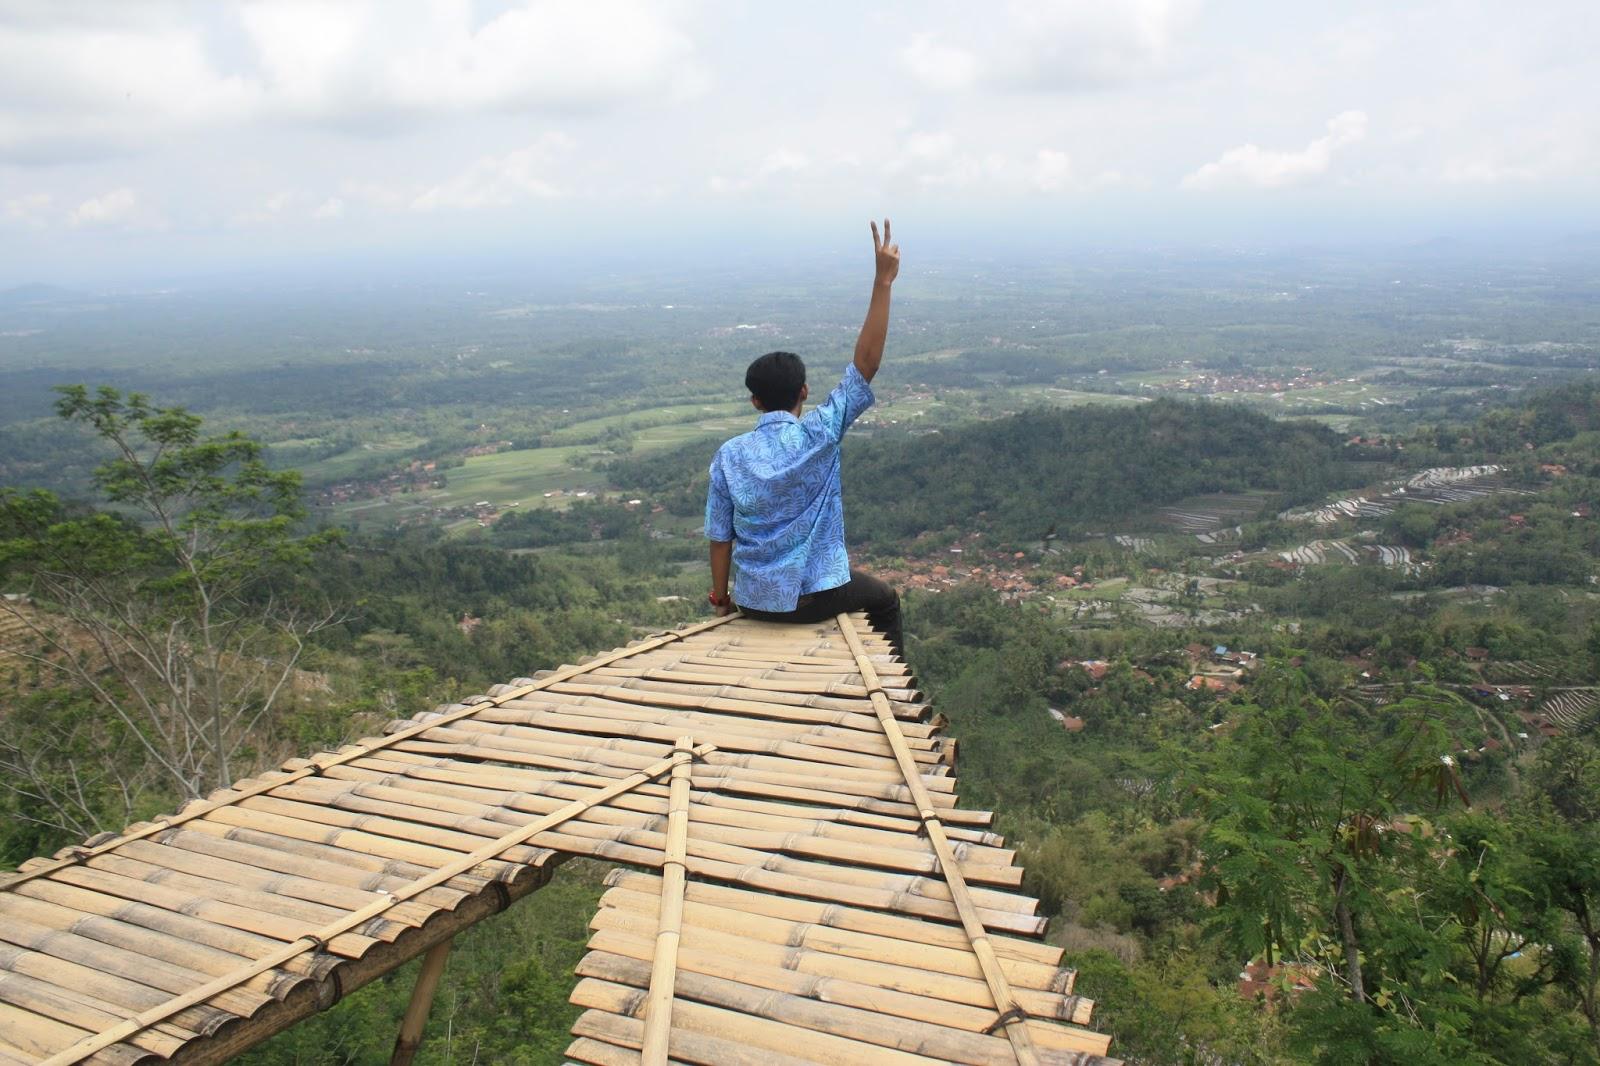 Kabar Magelang Tempat Wisata Terbaru Punthuk Mongkrong Yaaaa Lebih Tinggi